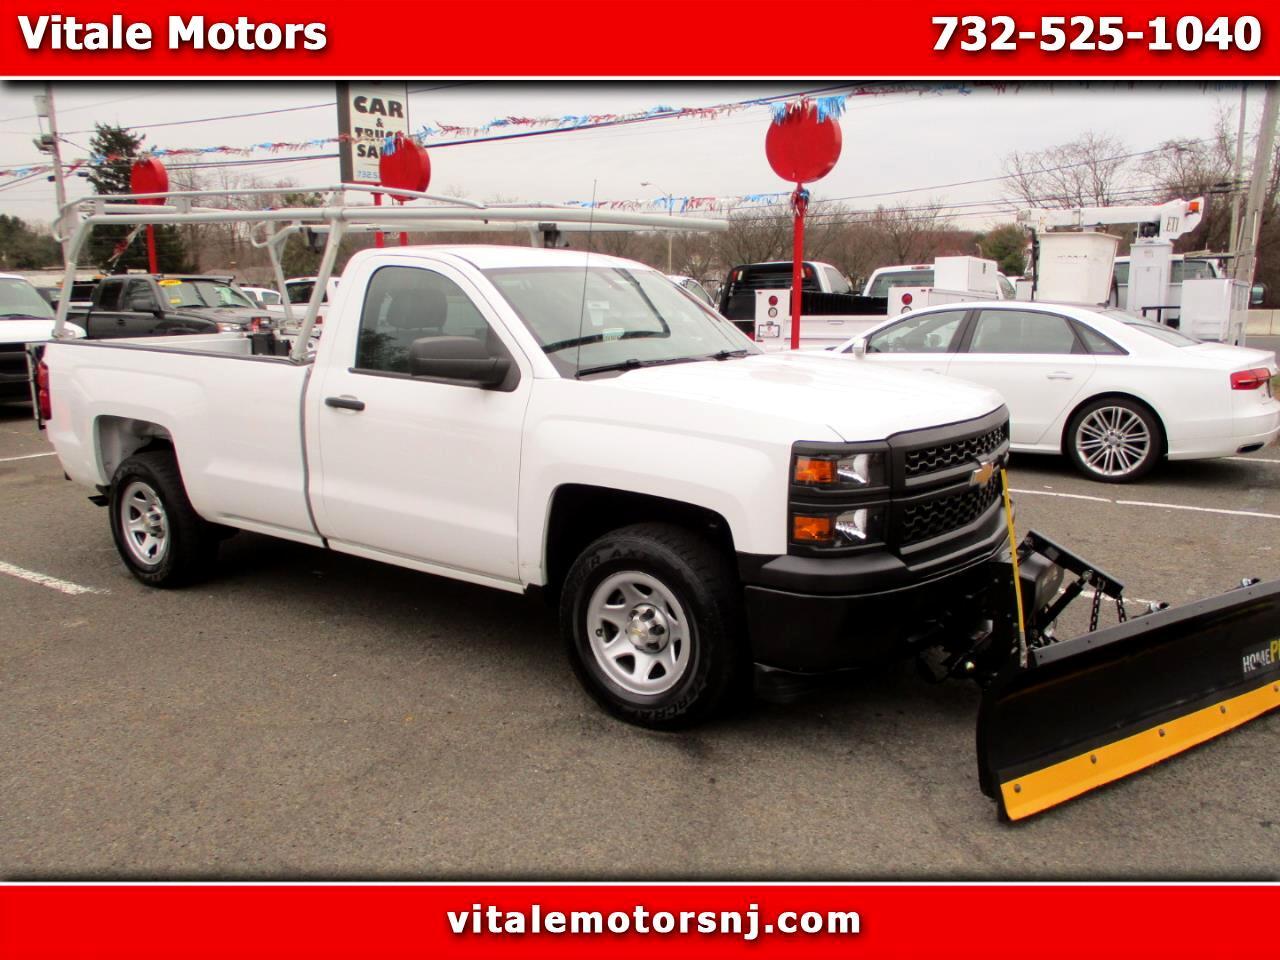 2014 Chevrolet Silverado 1500 REG. CAB LONG BED W/ LIFT GATE, LADDER RACK & SNOW